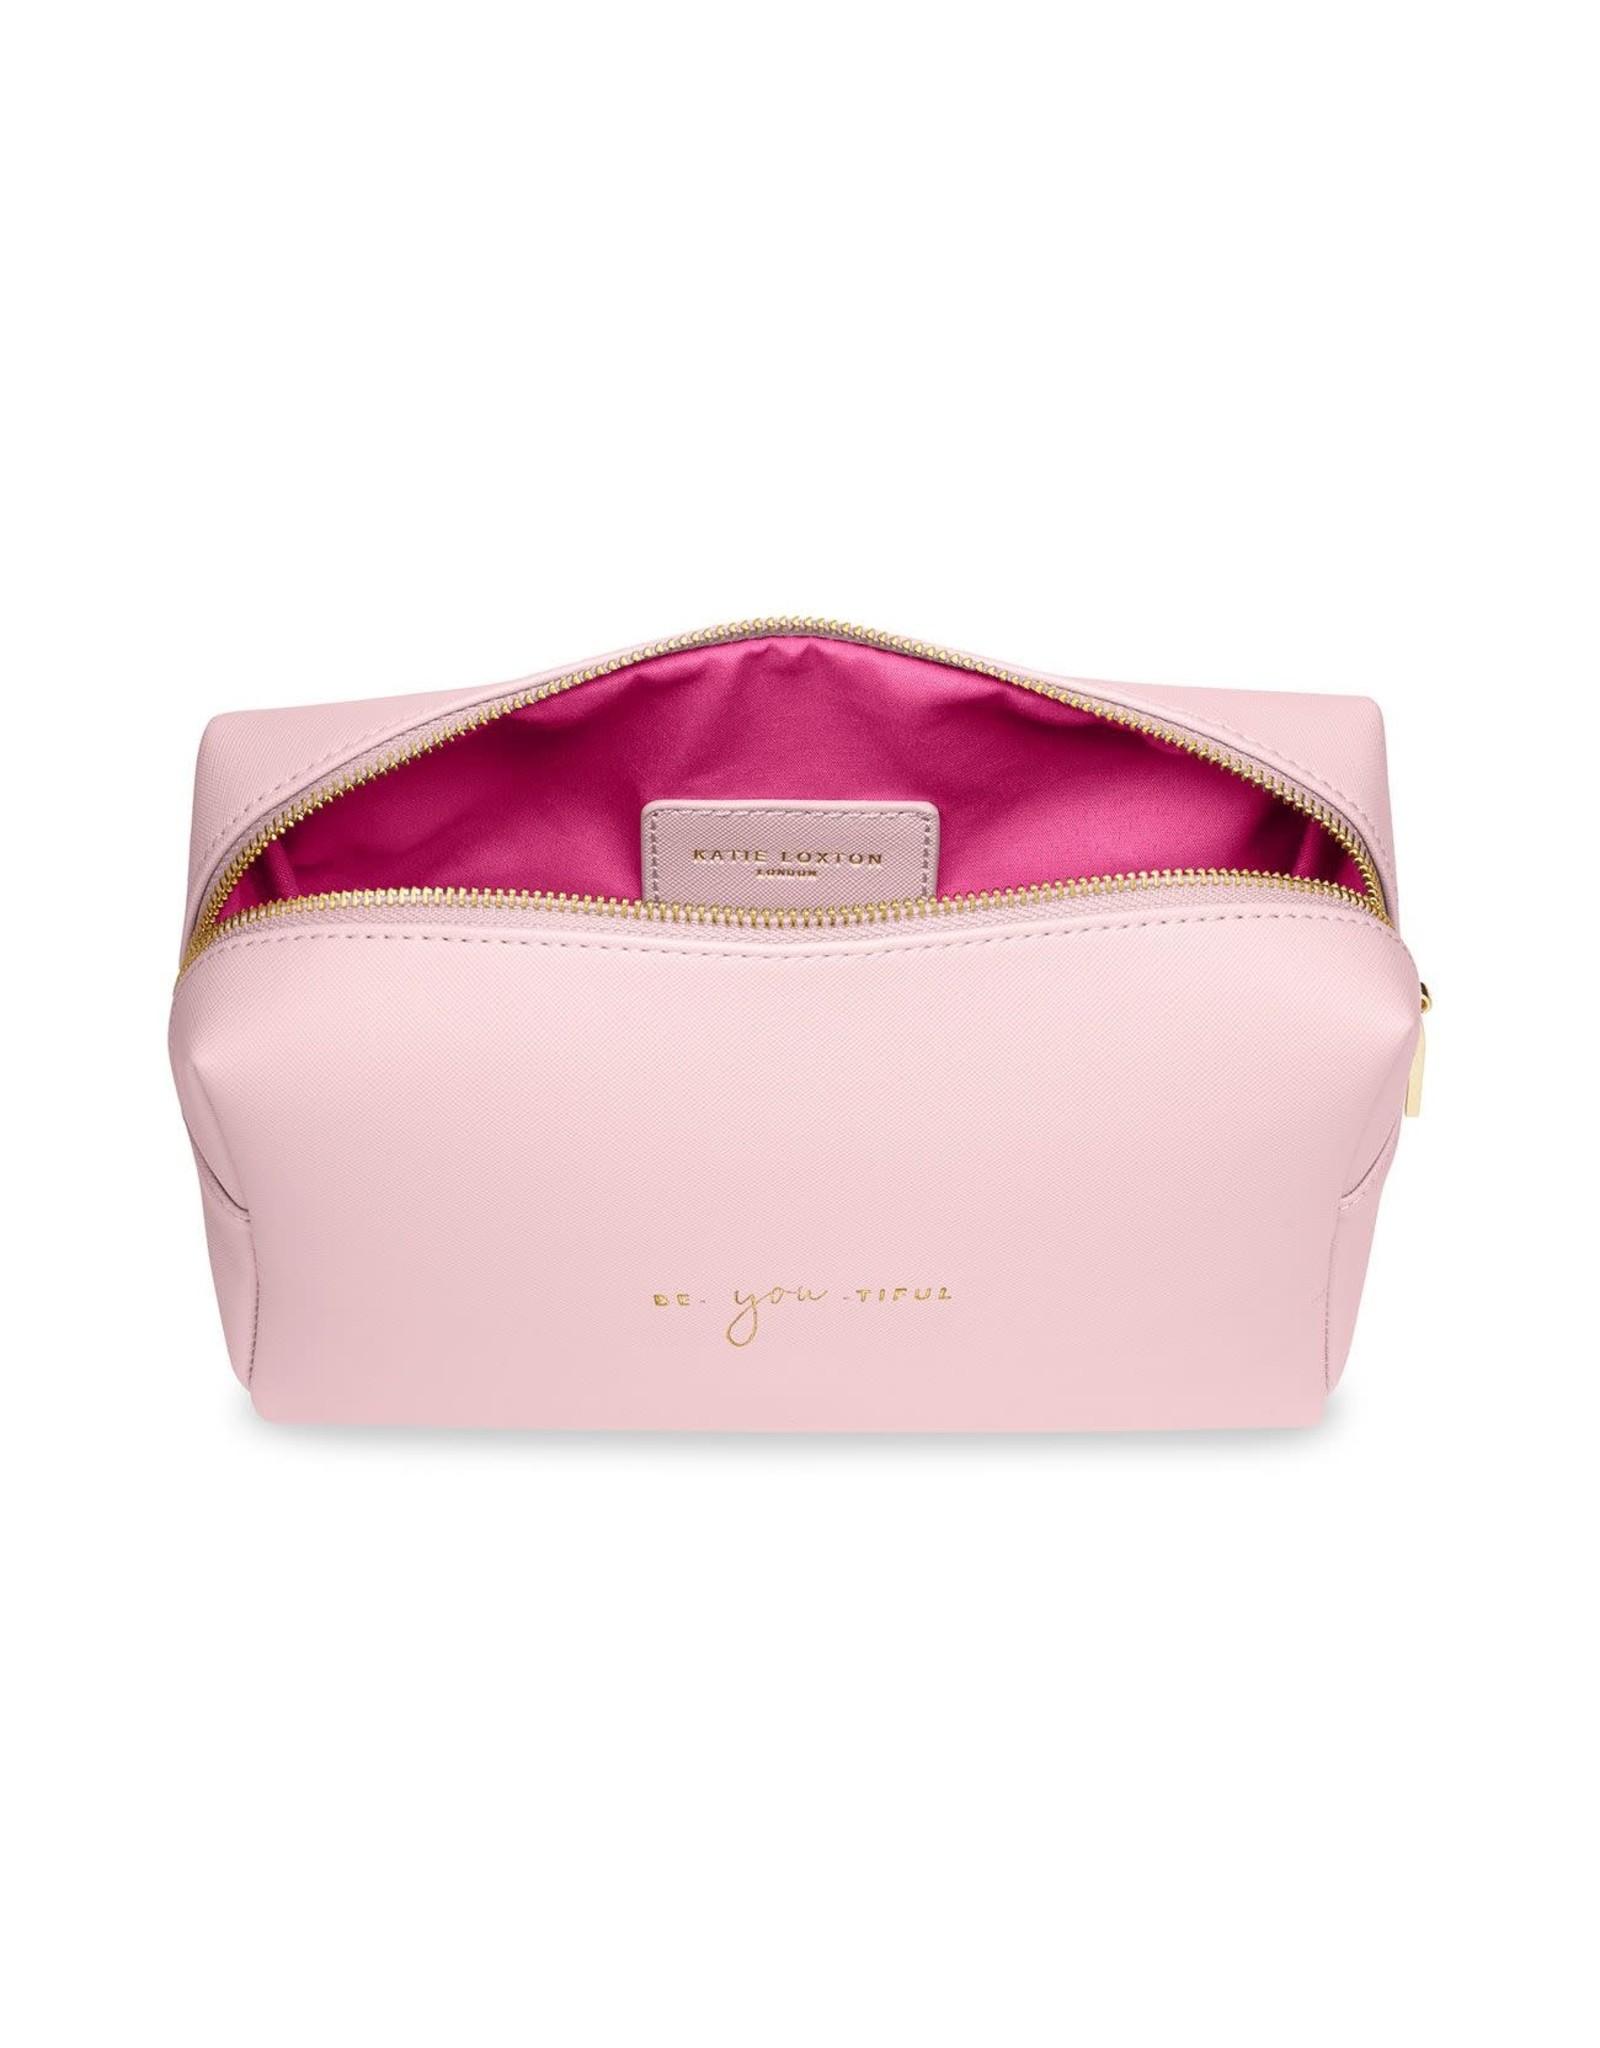 Katie Loxton Toilettas - Be-You-Tiful - Pink